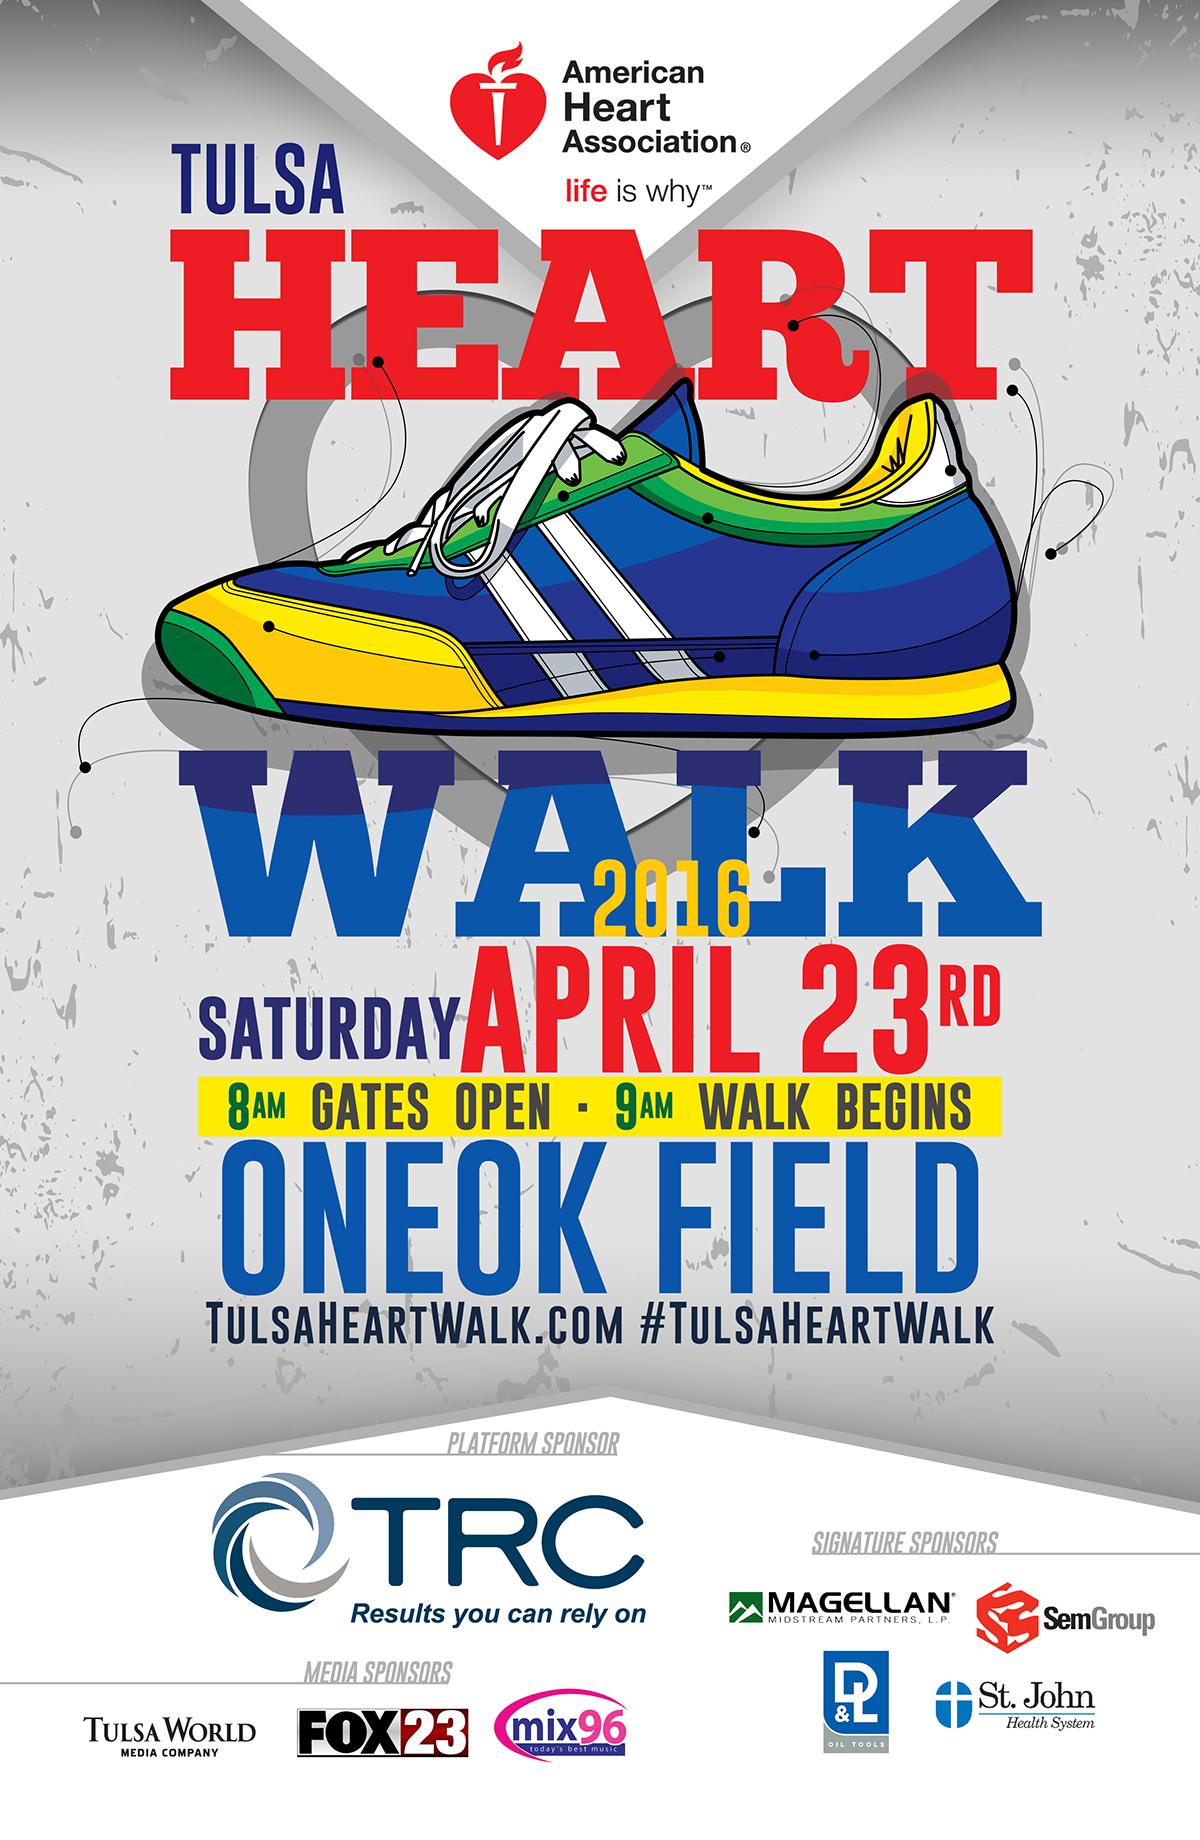 AHA Tulsa Heart Walk Poster on Behance